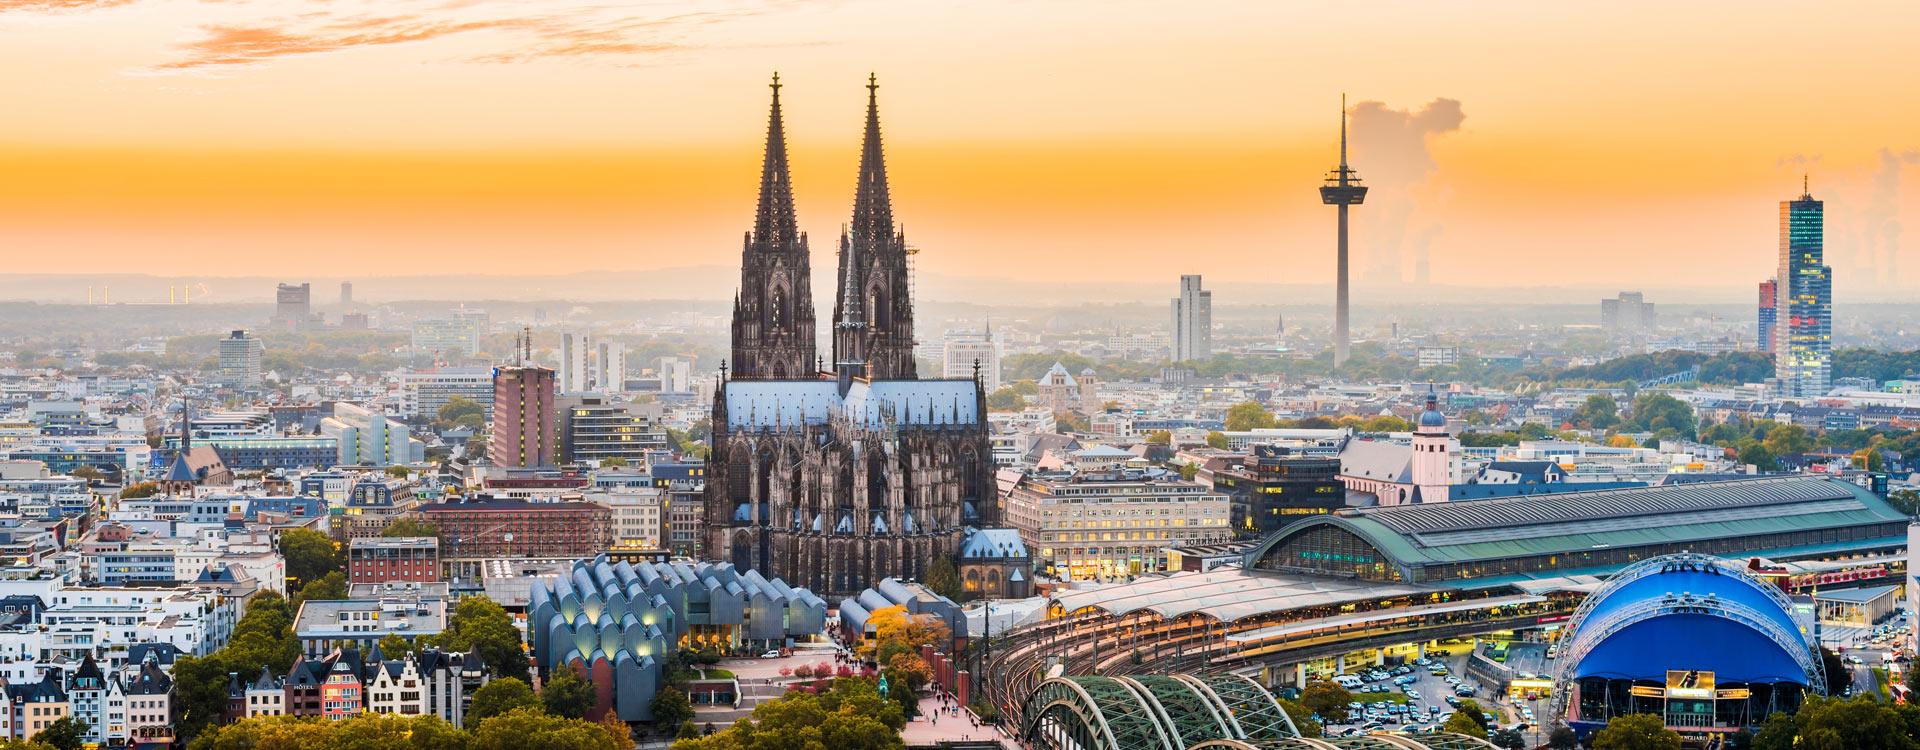 Partys in Köln mit koeln-partyreisen.de